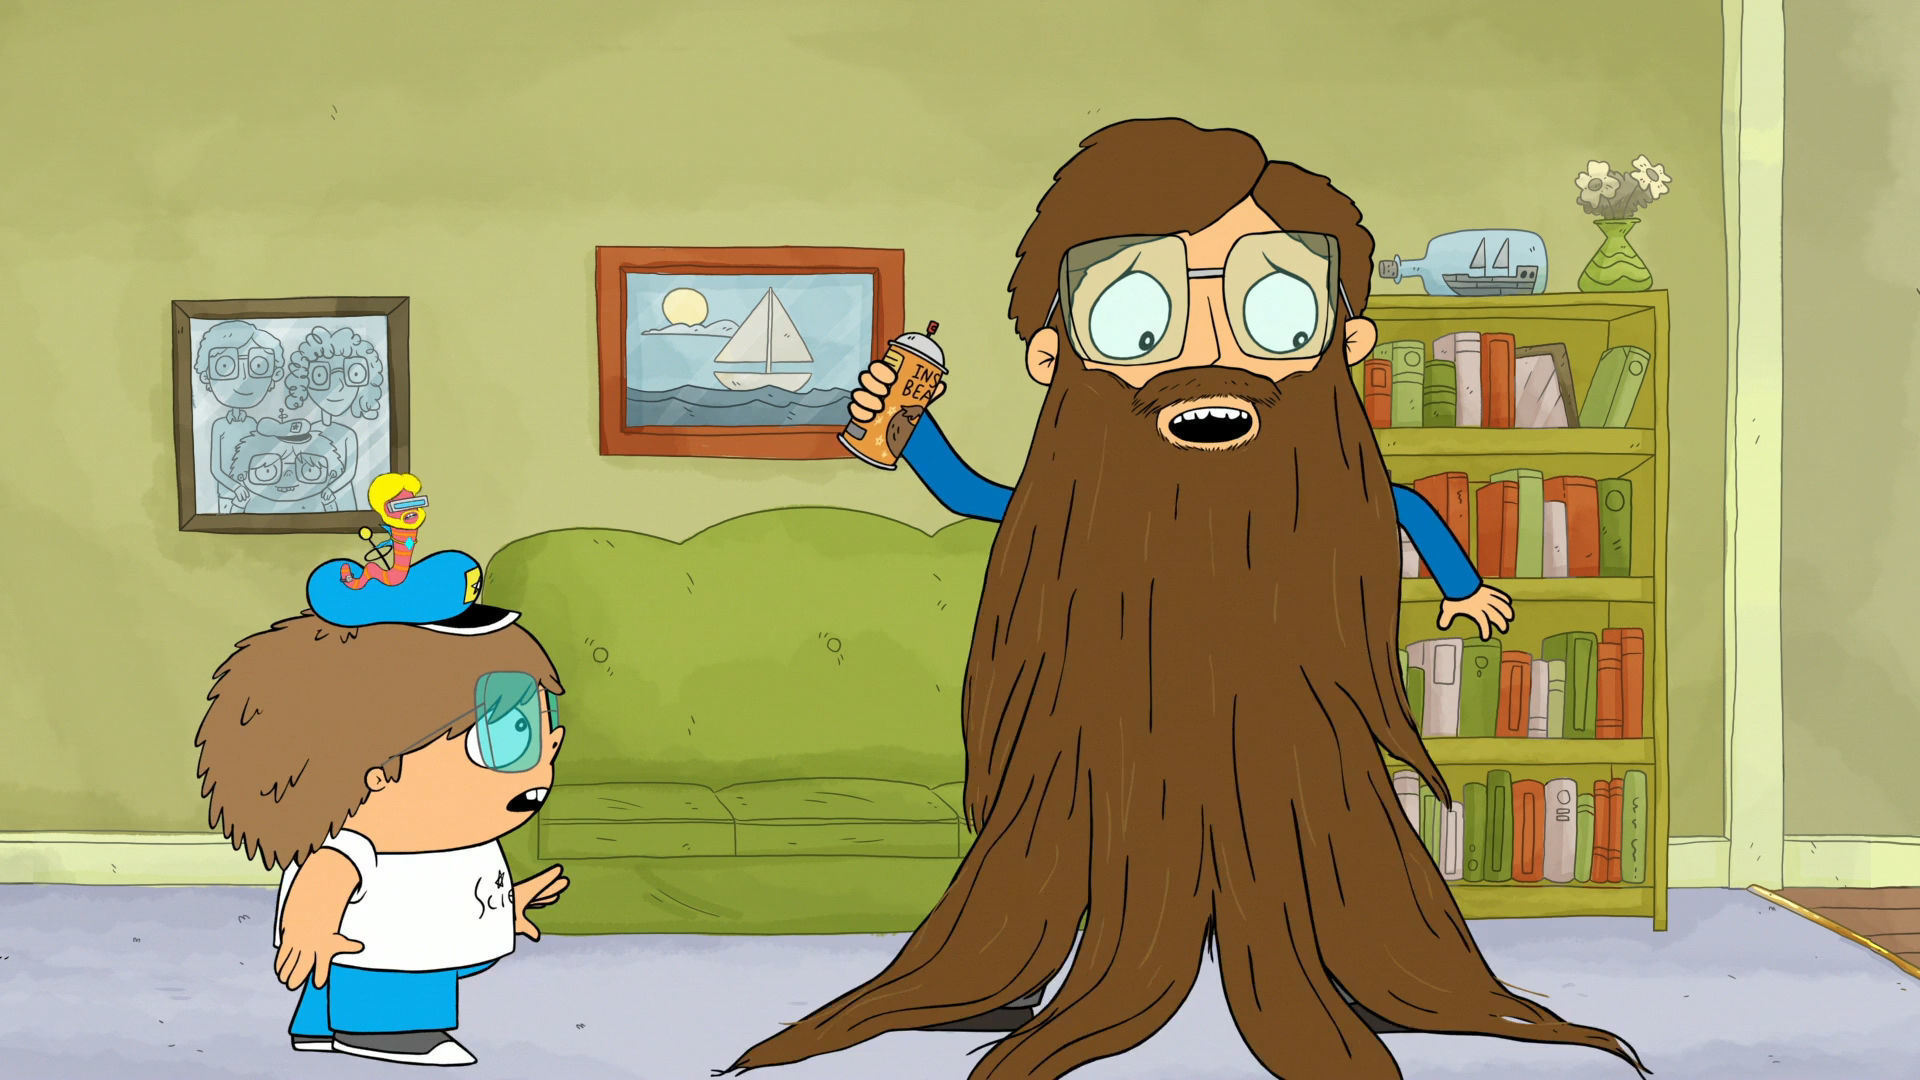 Insta-Beard